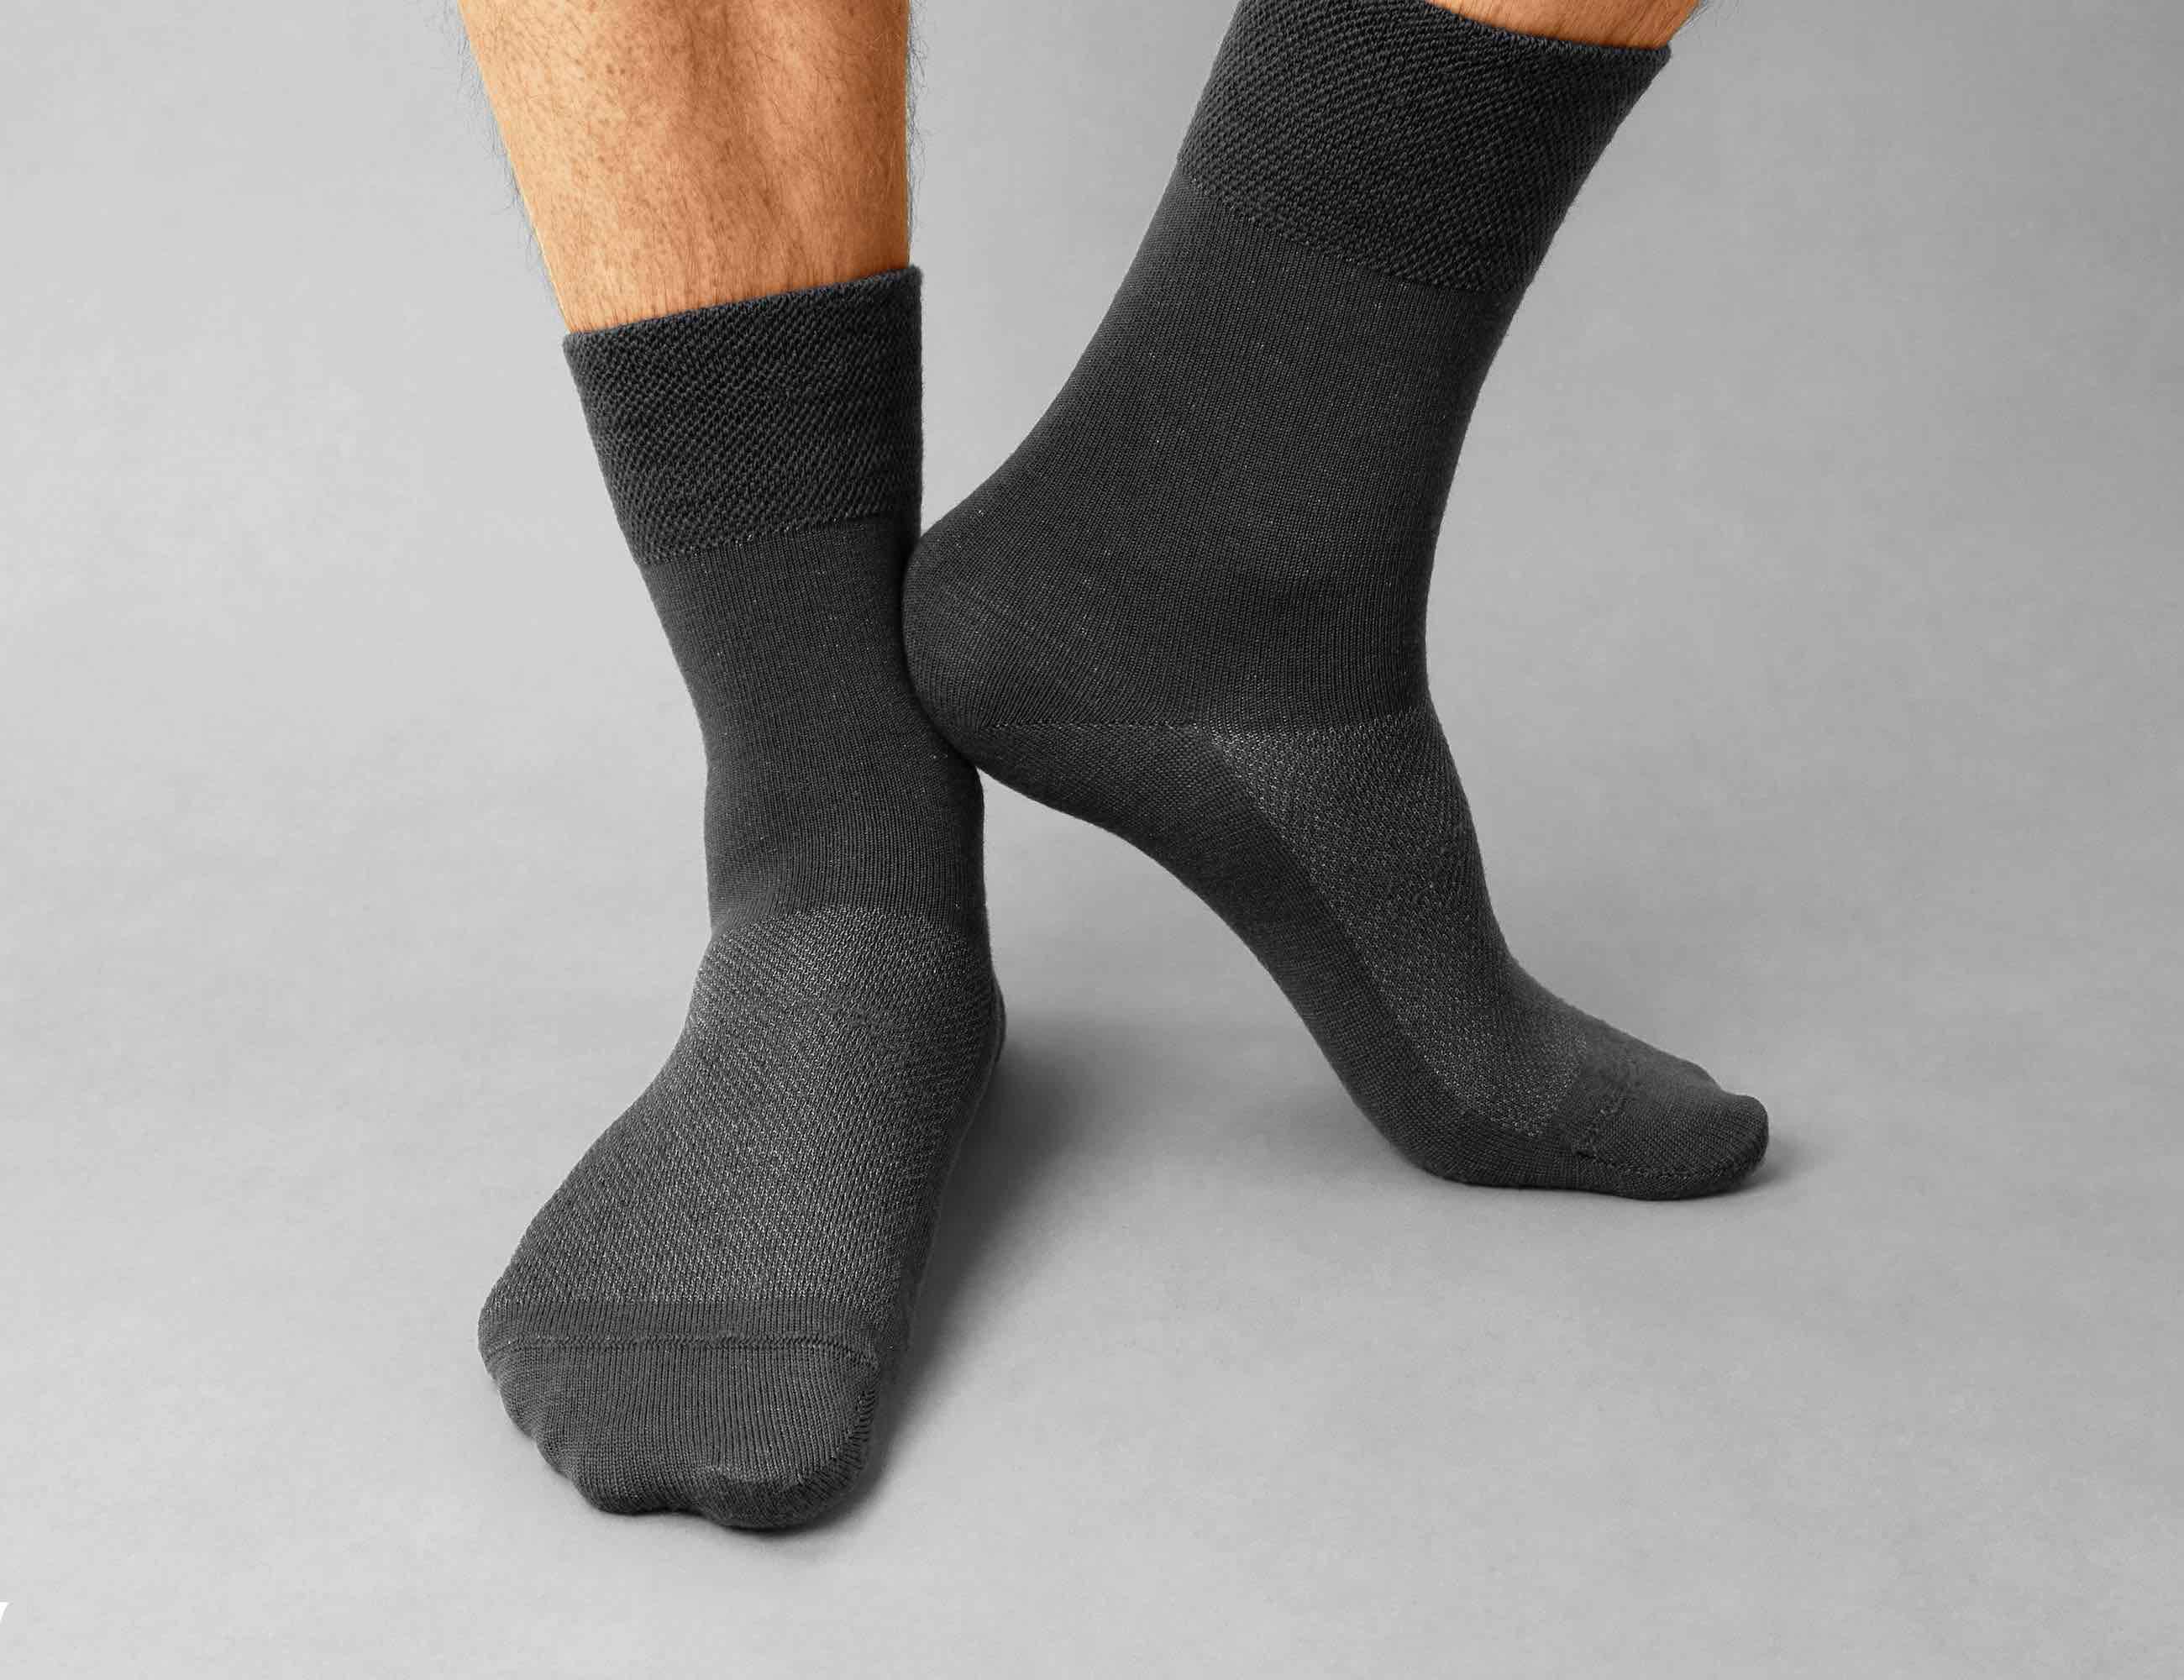 SilverSocks Ultra-Clean Crew Socks